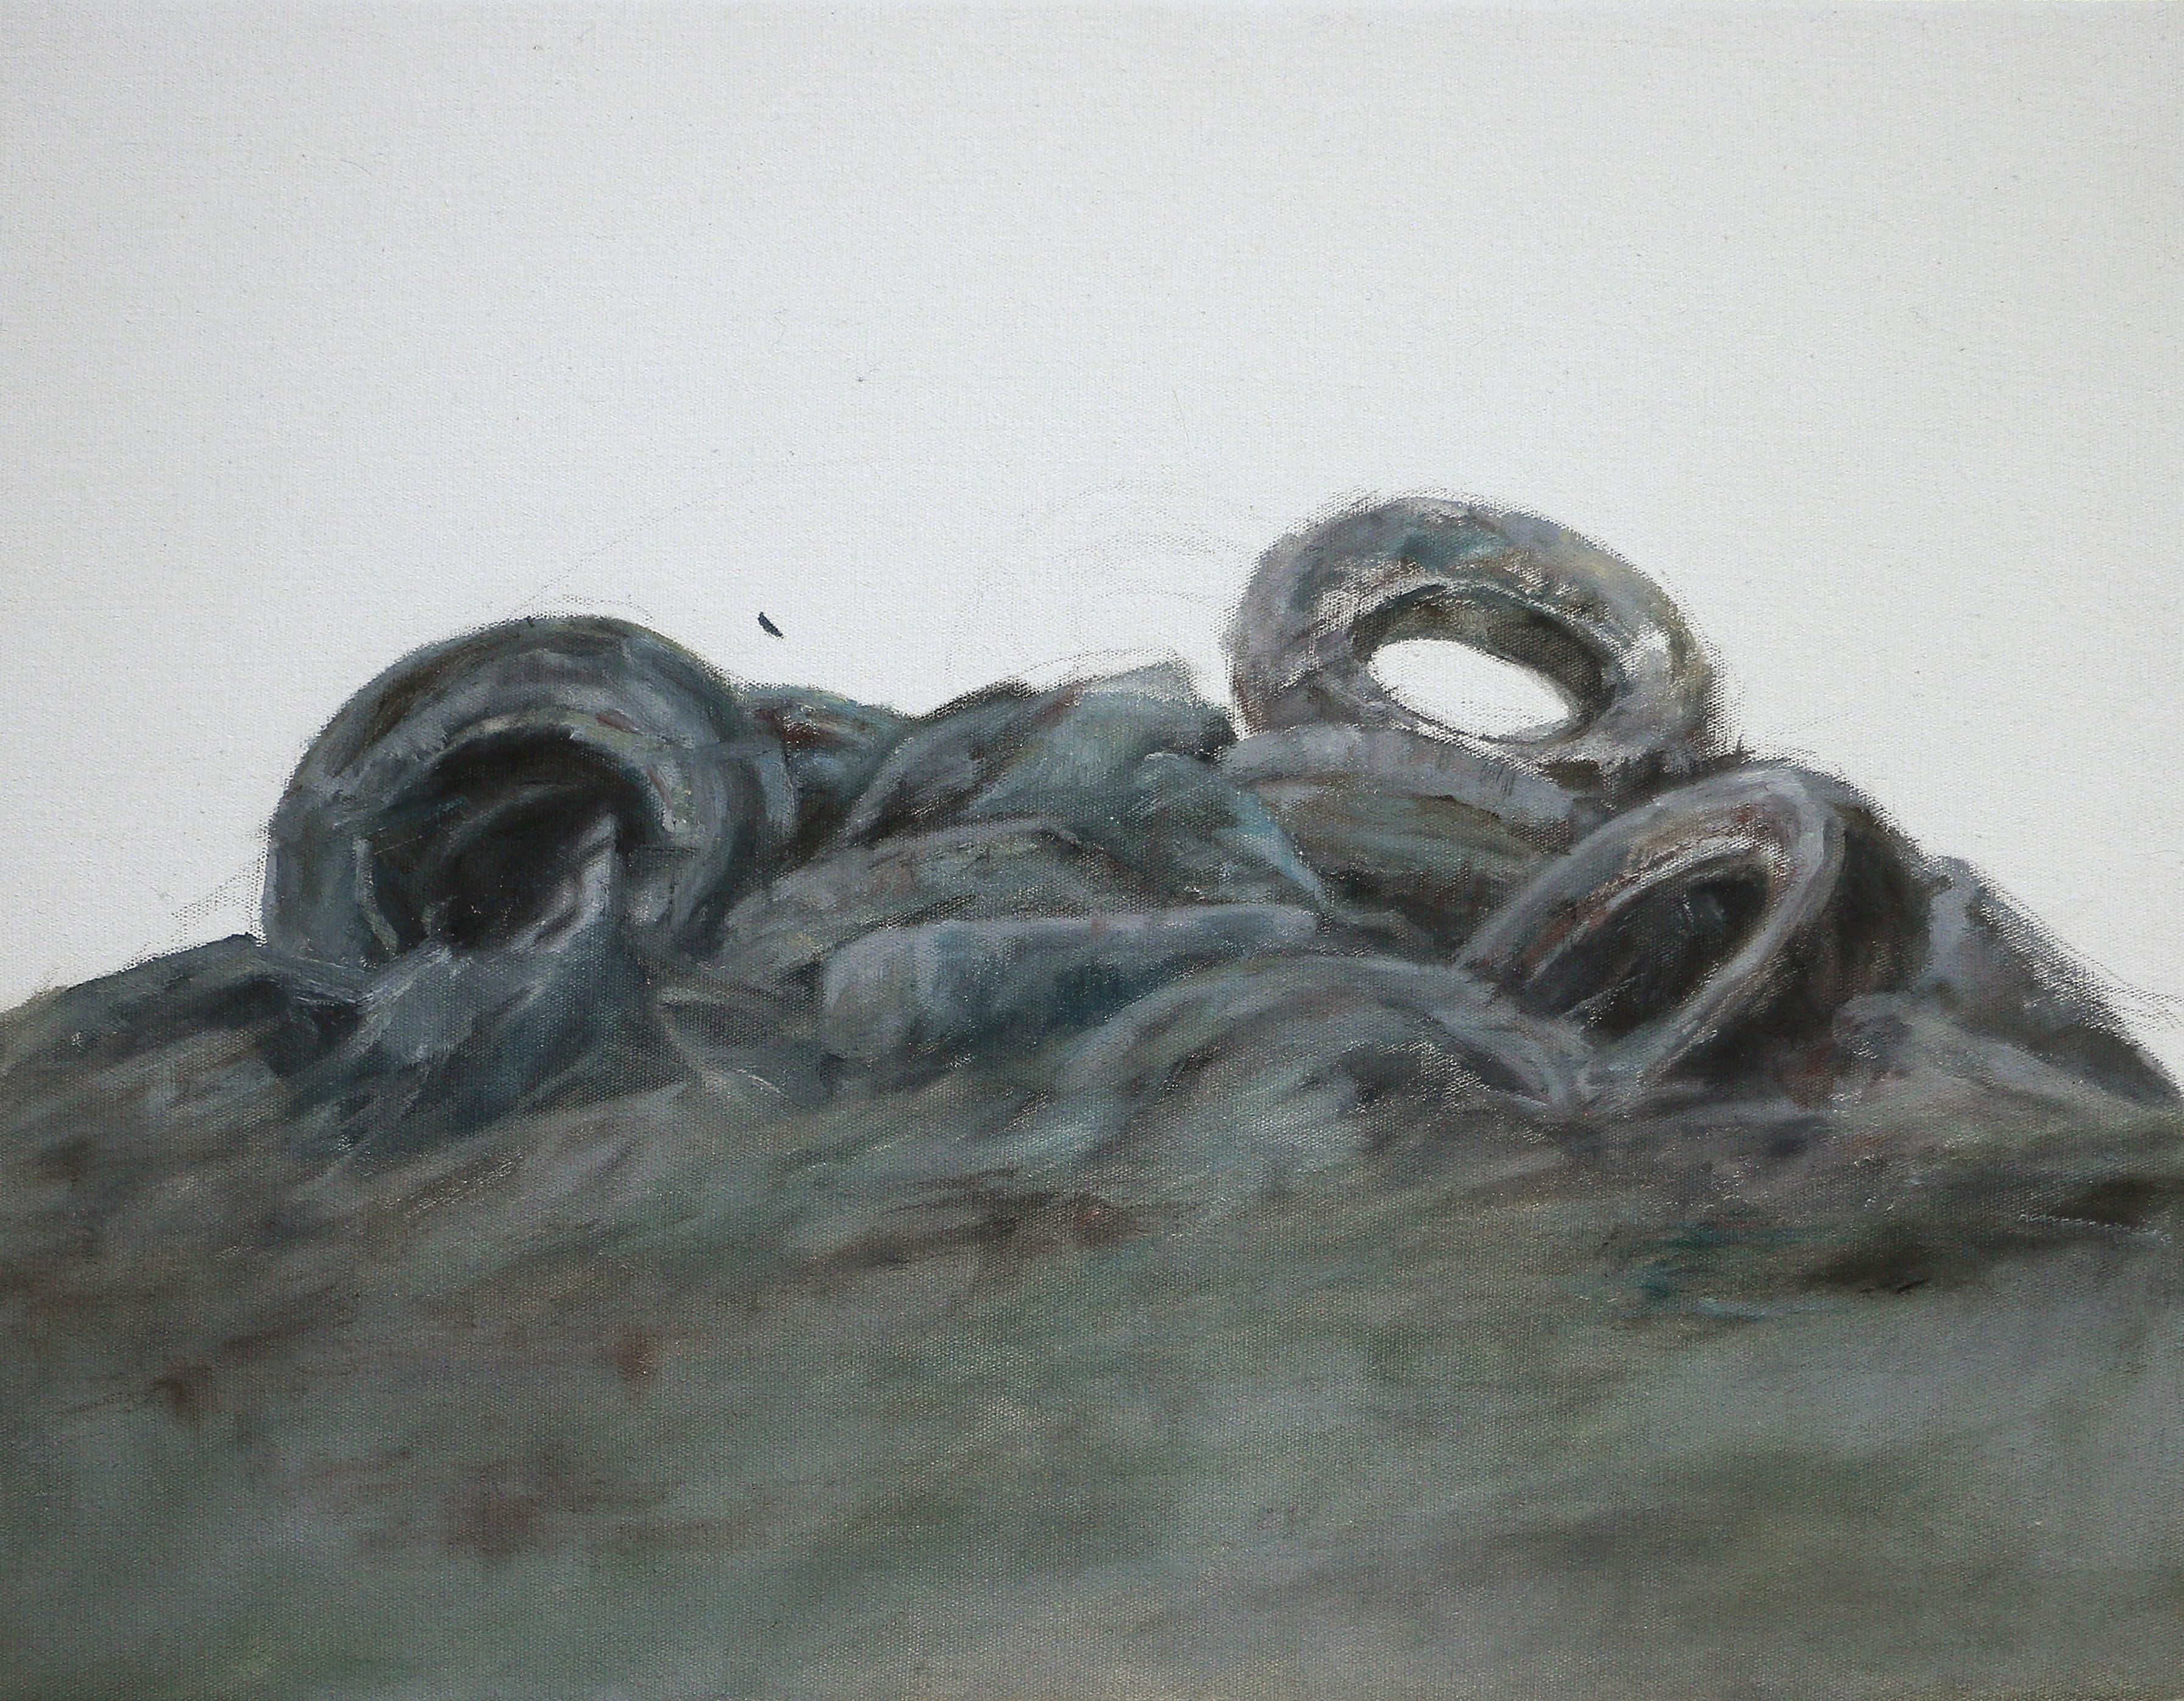 PNEUS#2, 2018, huile sur toile, 16 x 22 cm